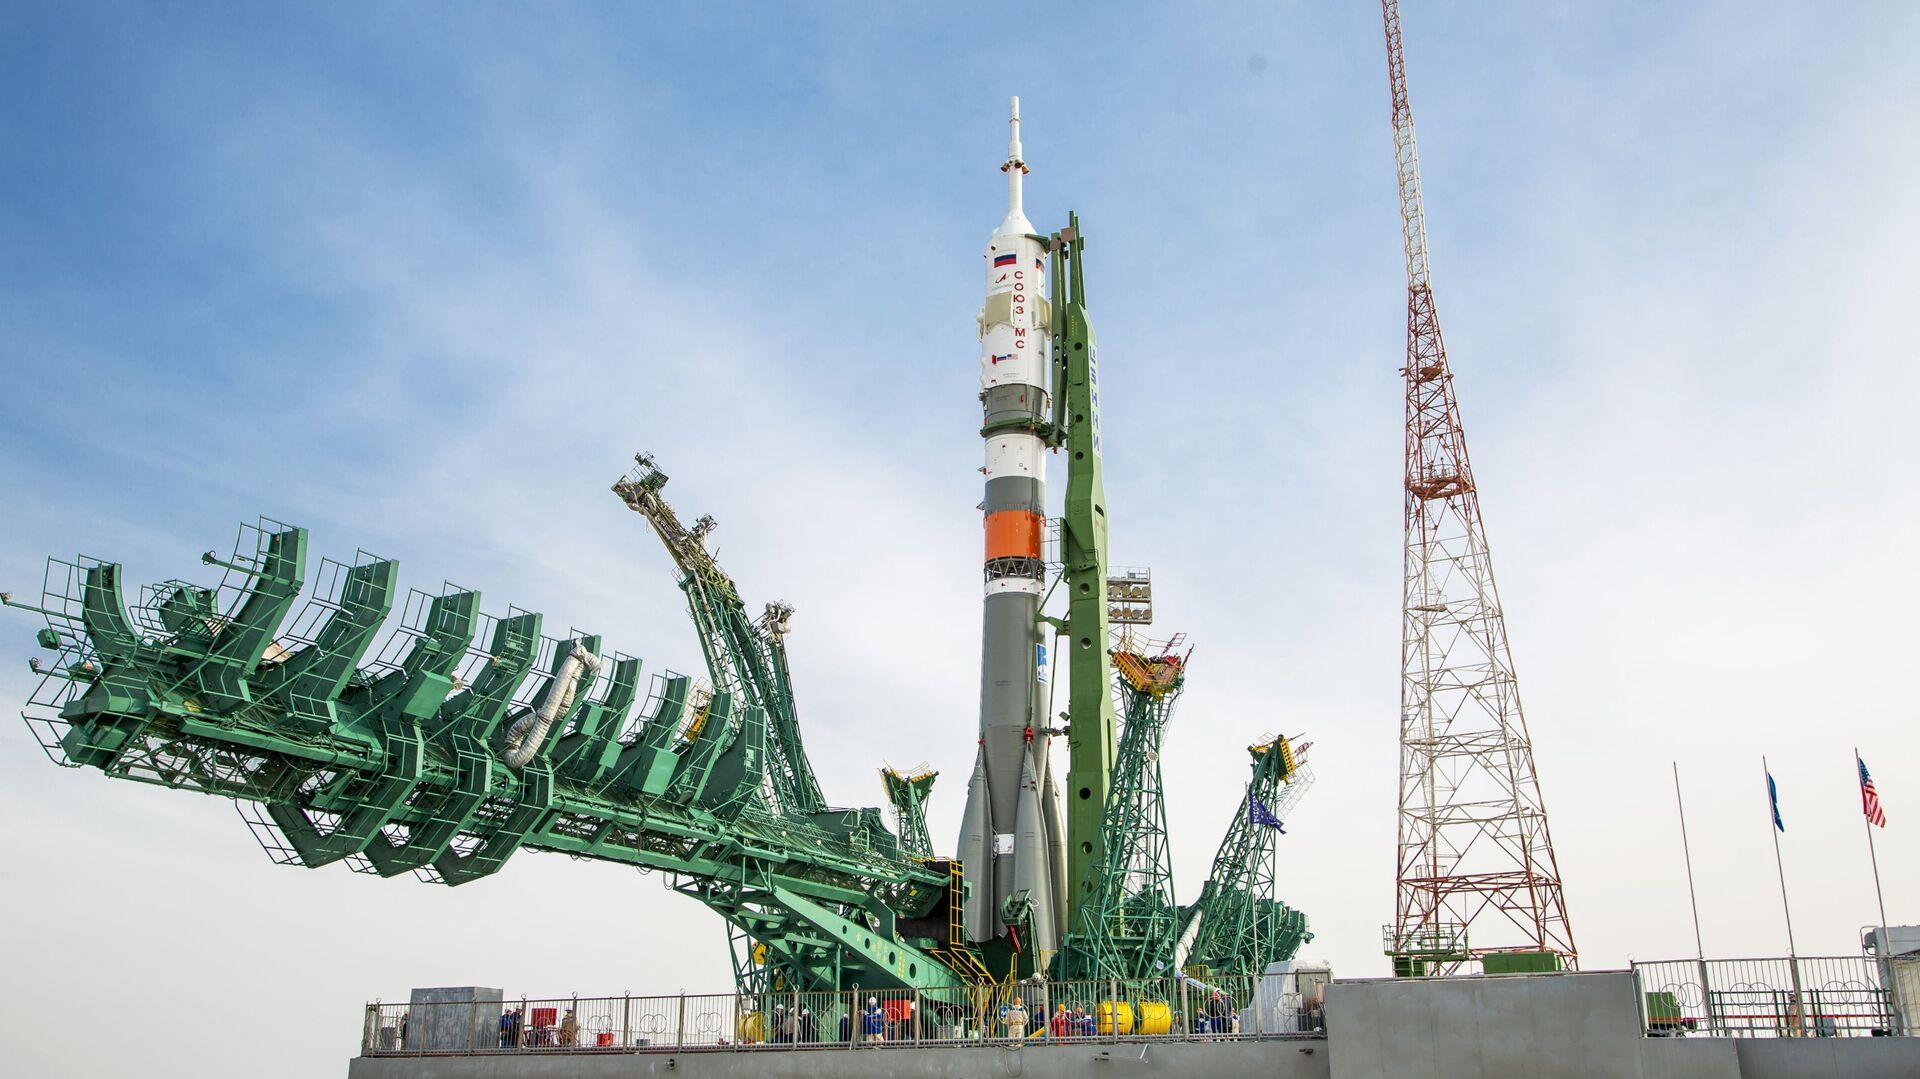 Cohete ruso Soyuz 2.1a - Sputnik Mundo, 1920, 25.04.2021